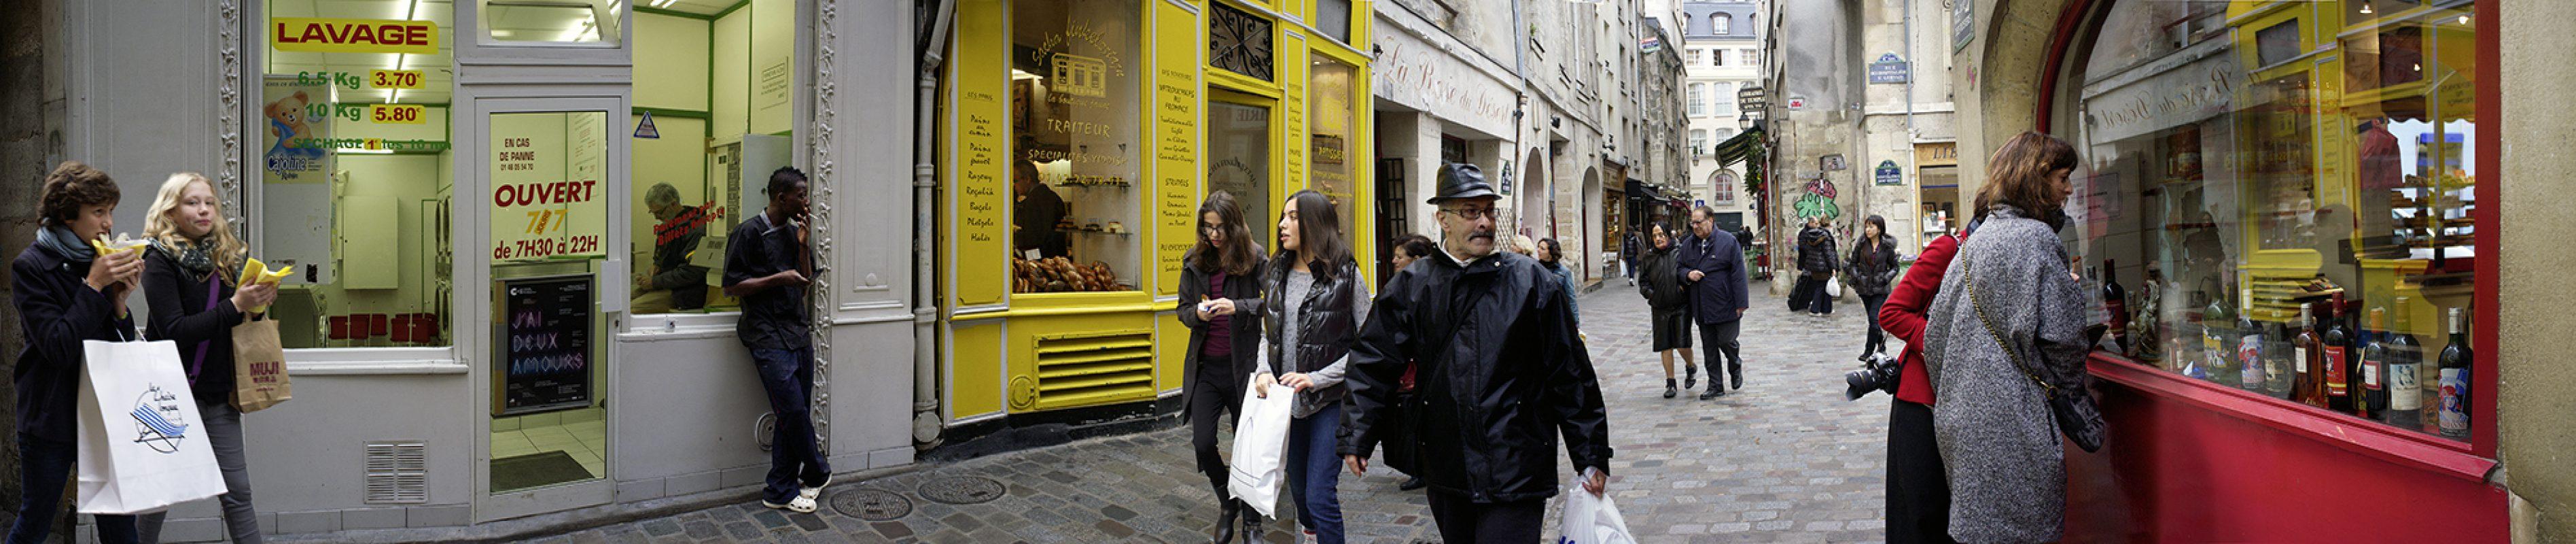 Rue de Rosiers, Marais